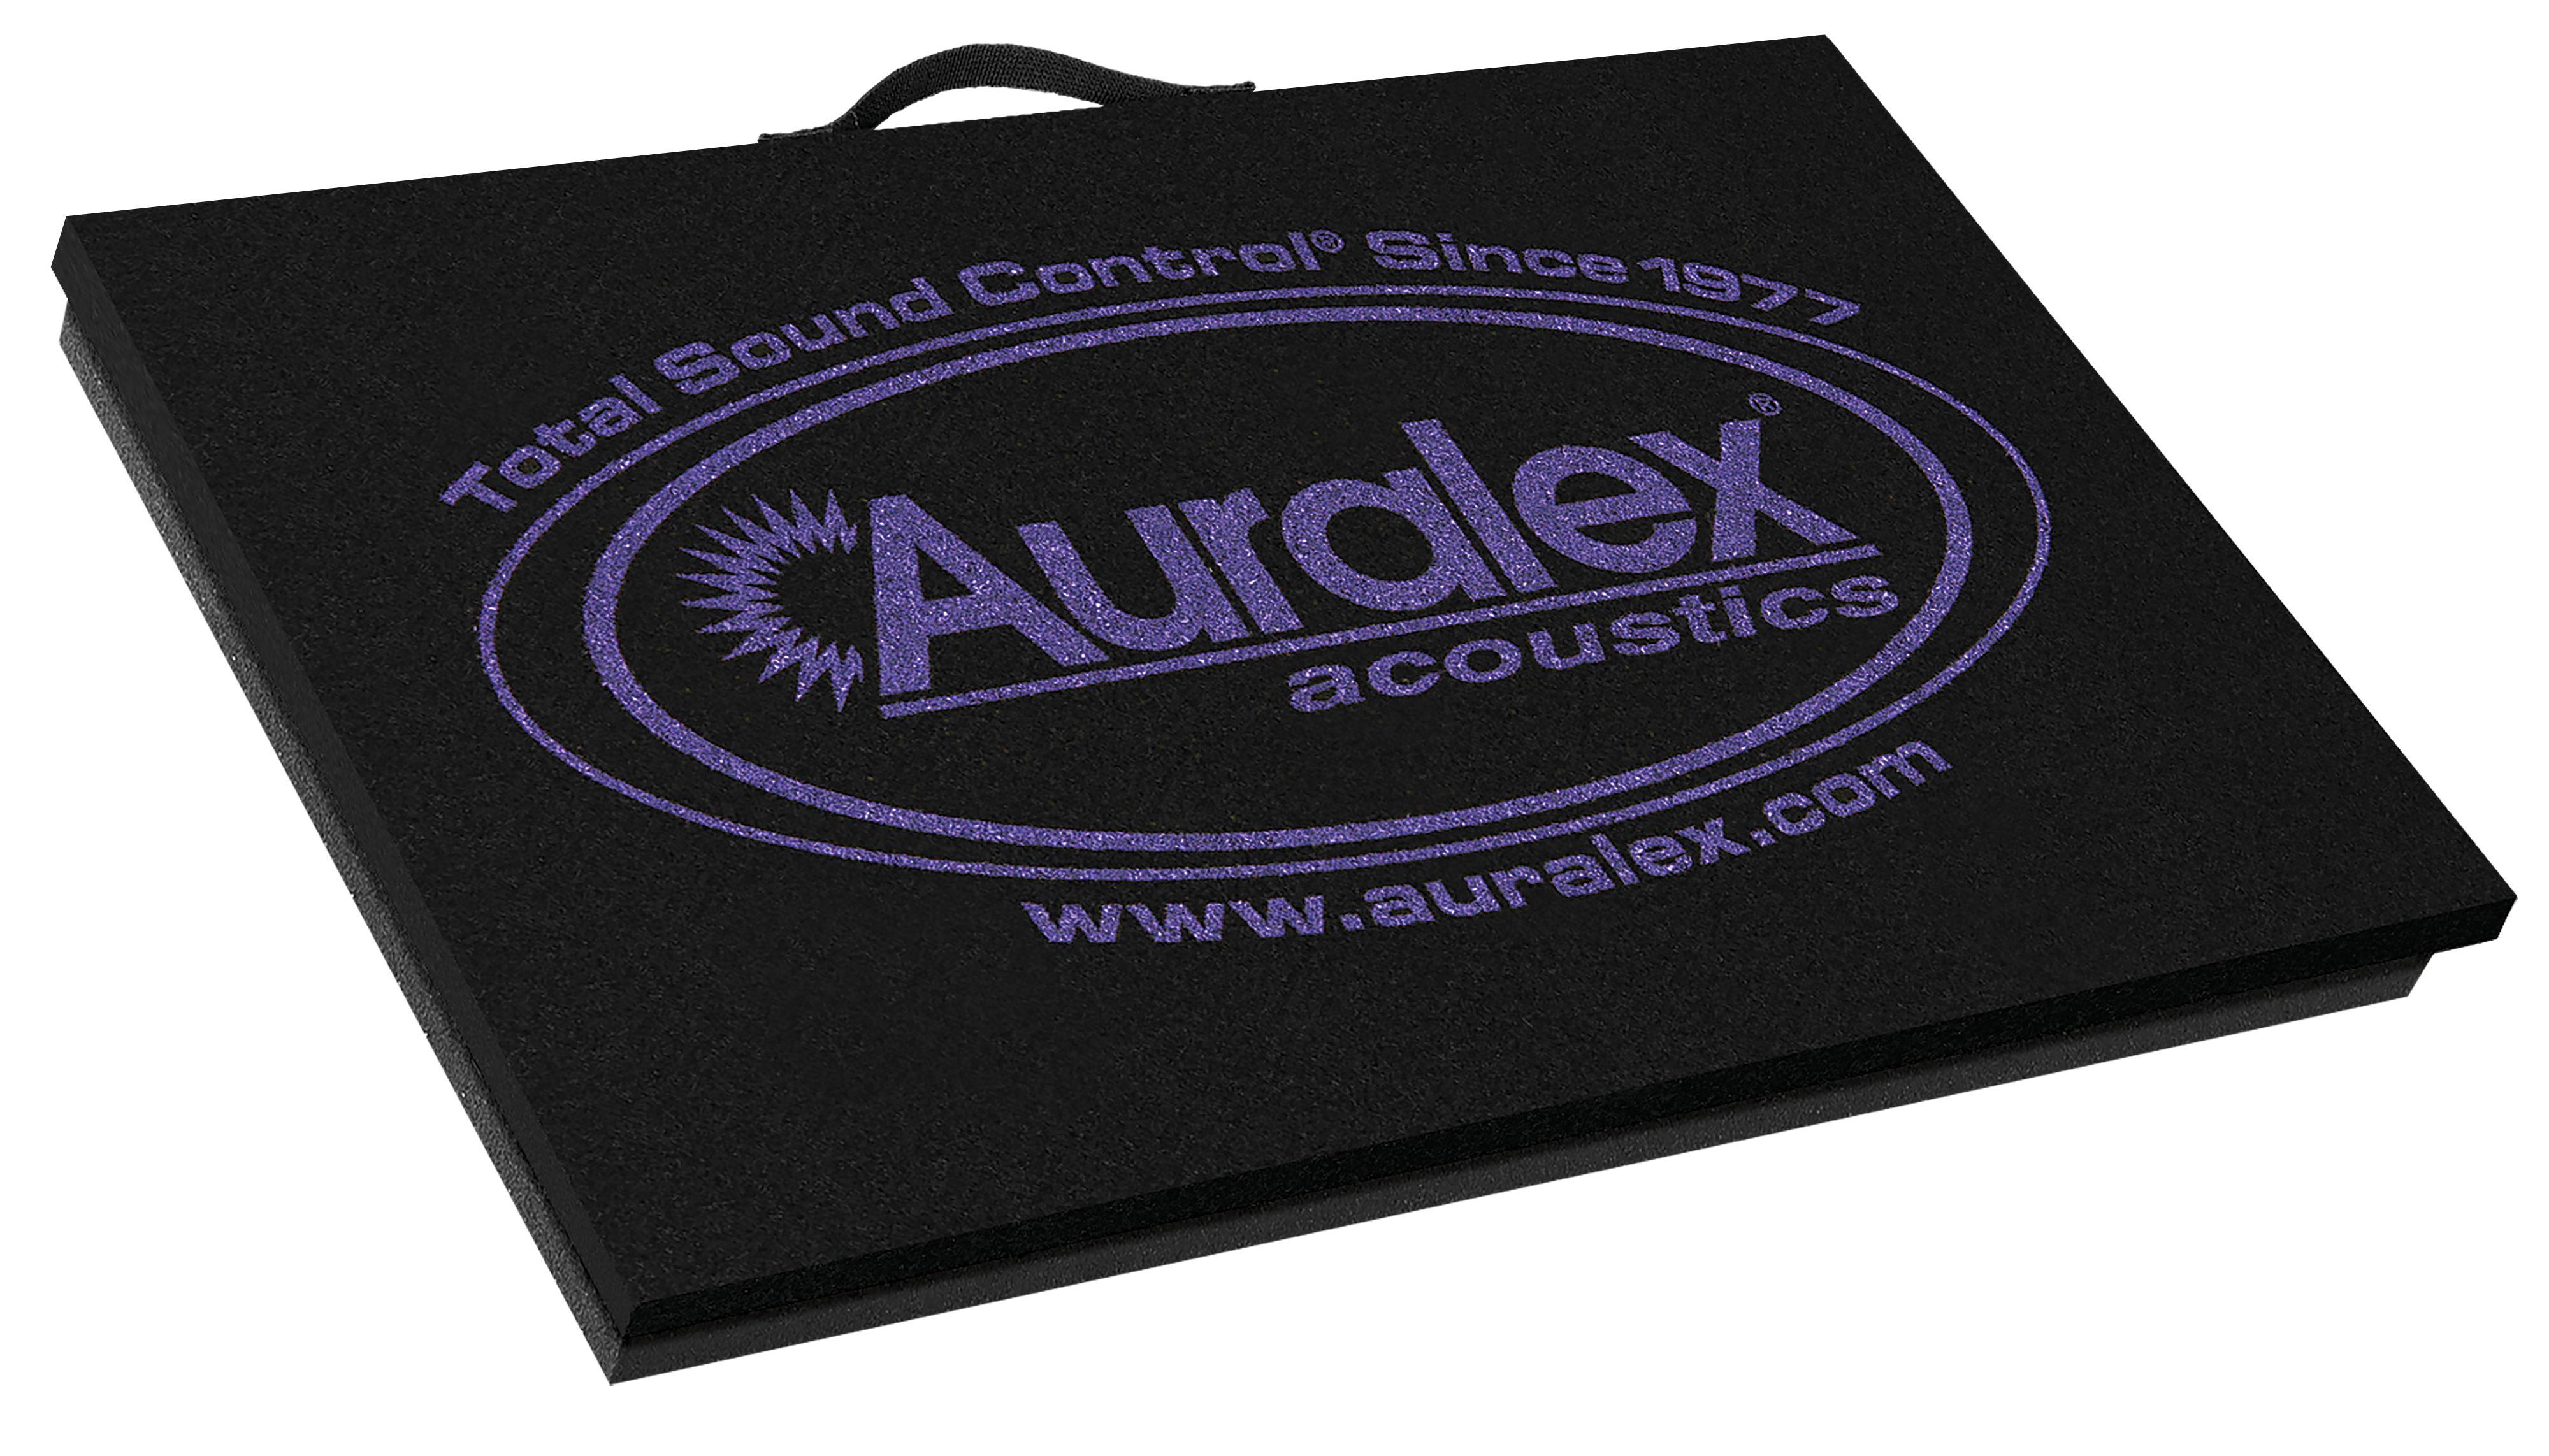 Auralex GRAMMA V2 Subdude Attenuator